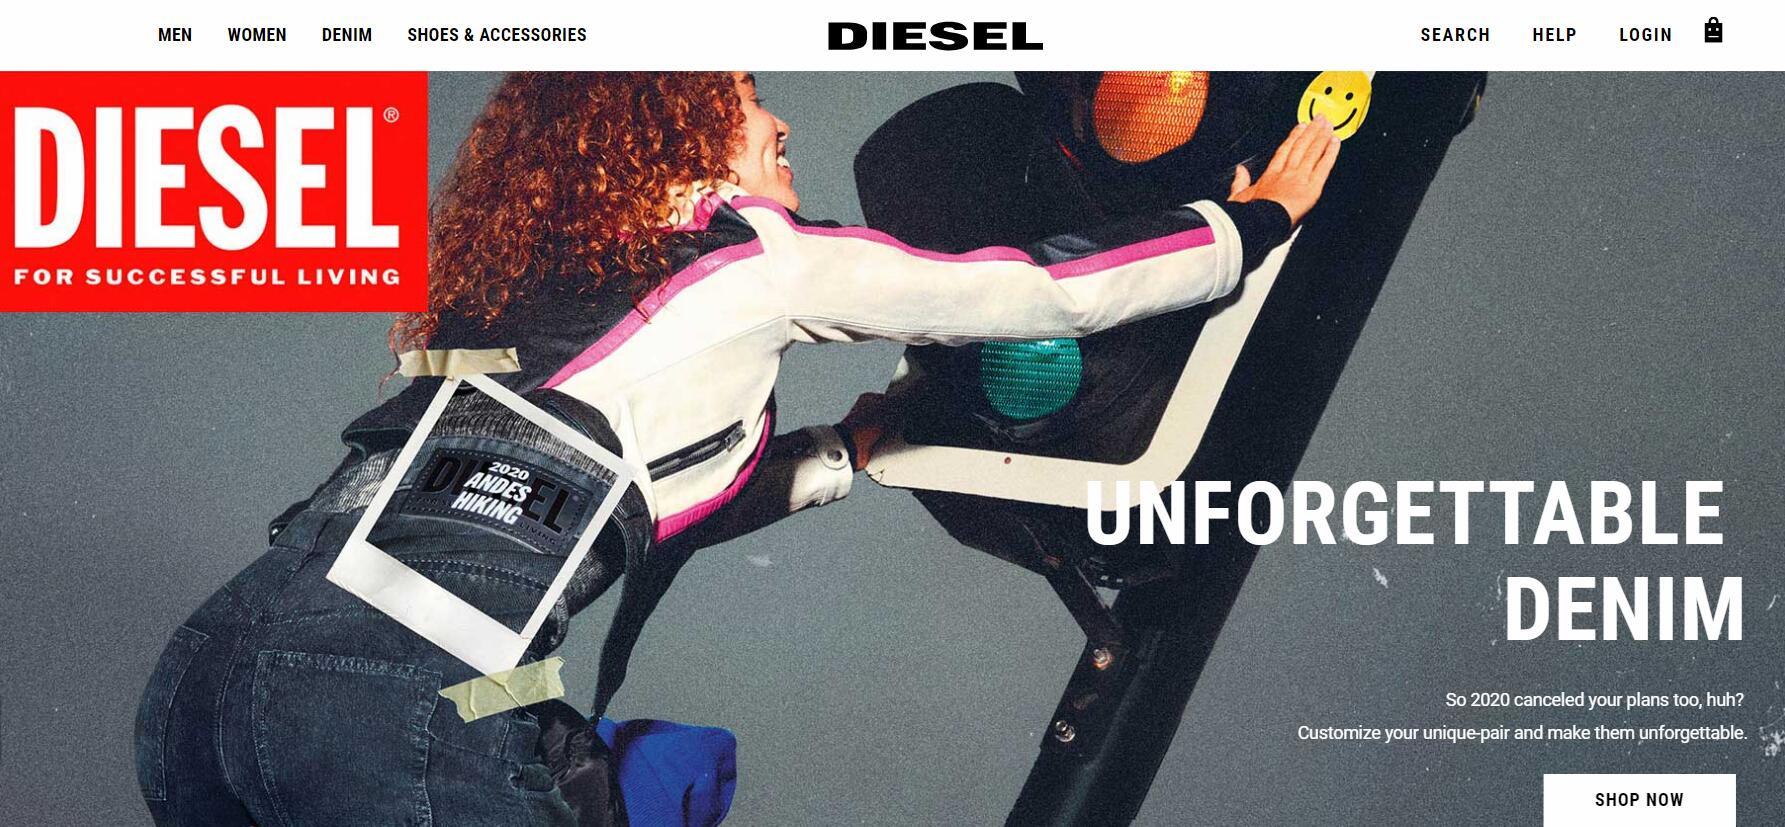 Chanel 密集投资意大利奢侈品供应链,又收购一家常年合作的鞋履制造商:Ballin